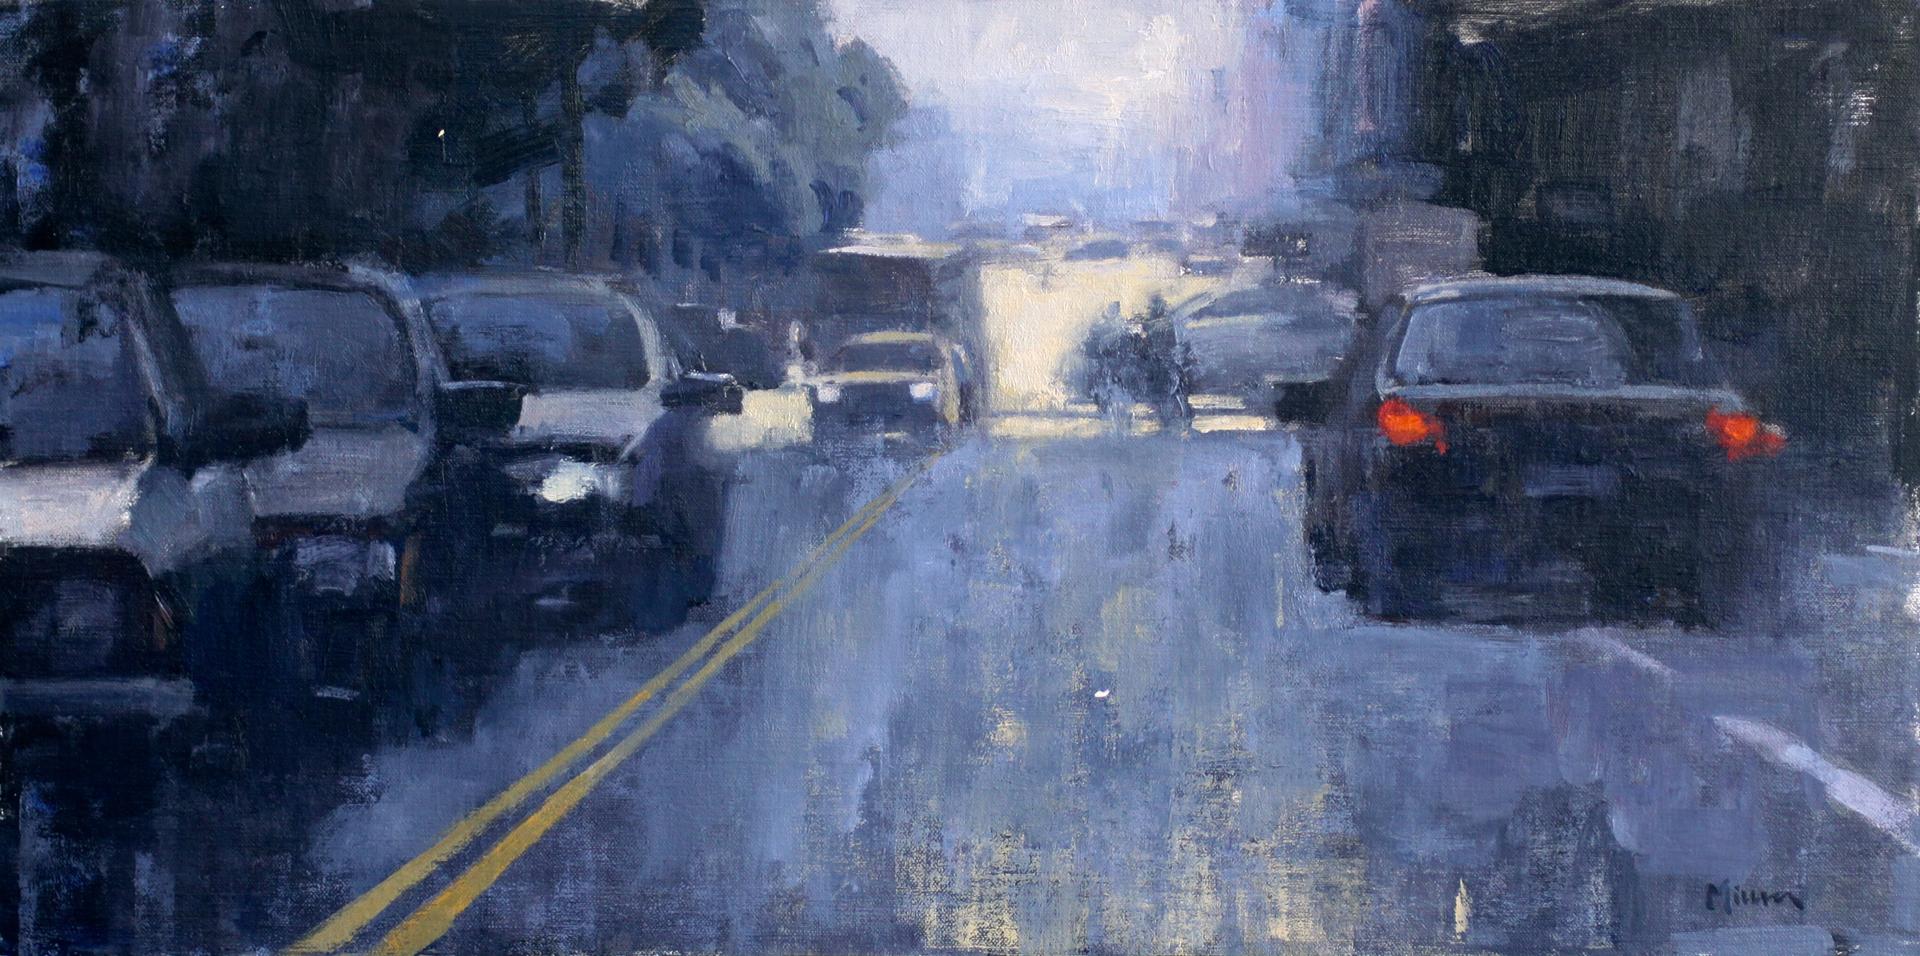 Urban Blues by Terry Miura